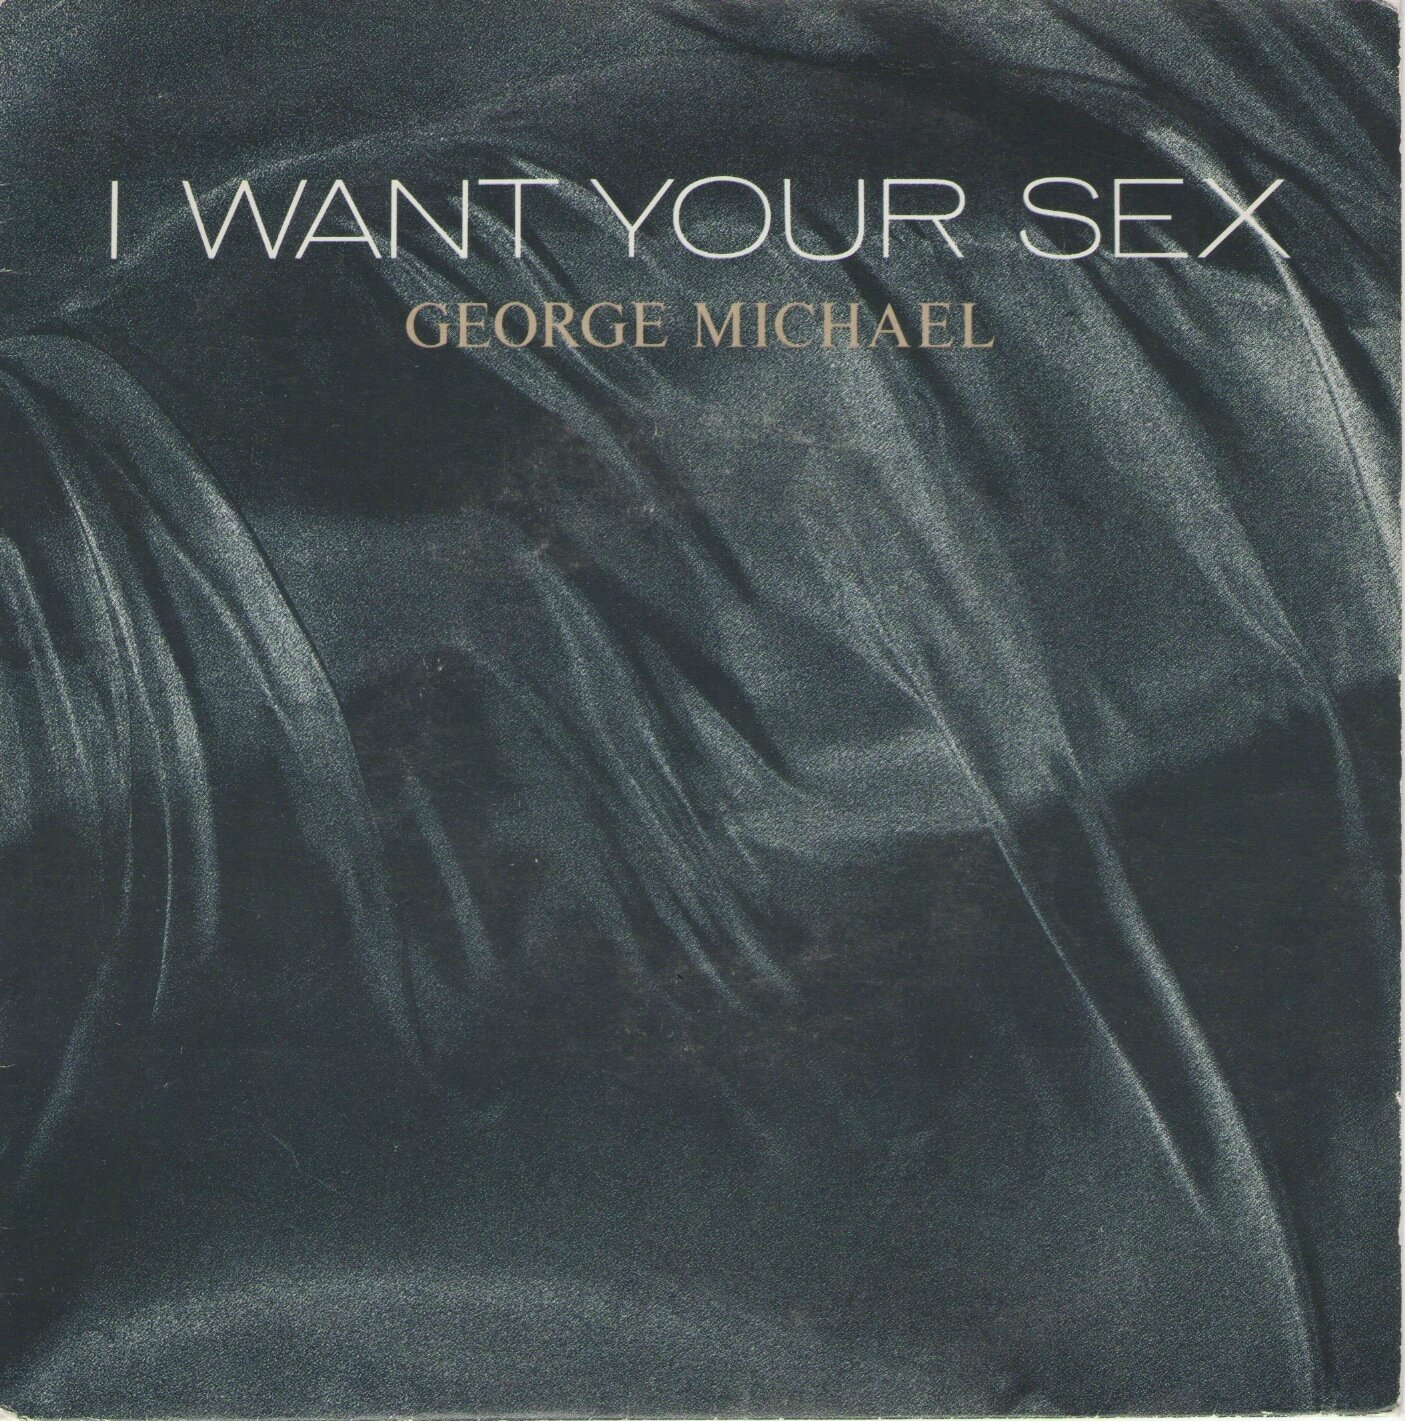 george i michael sex want